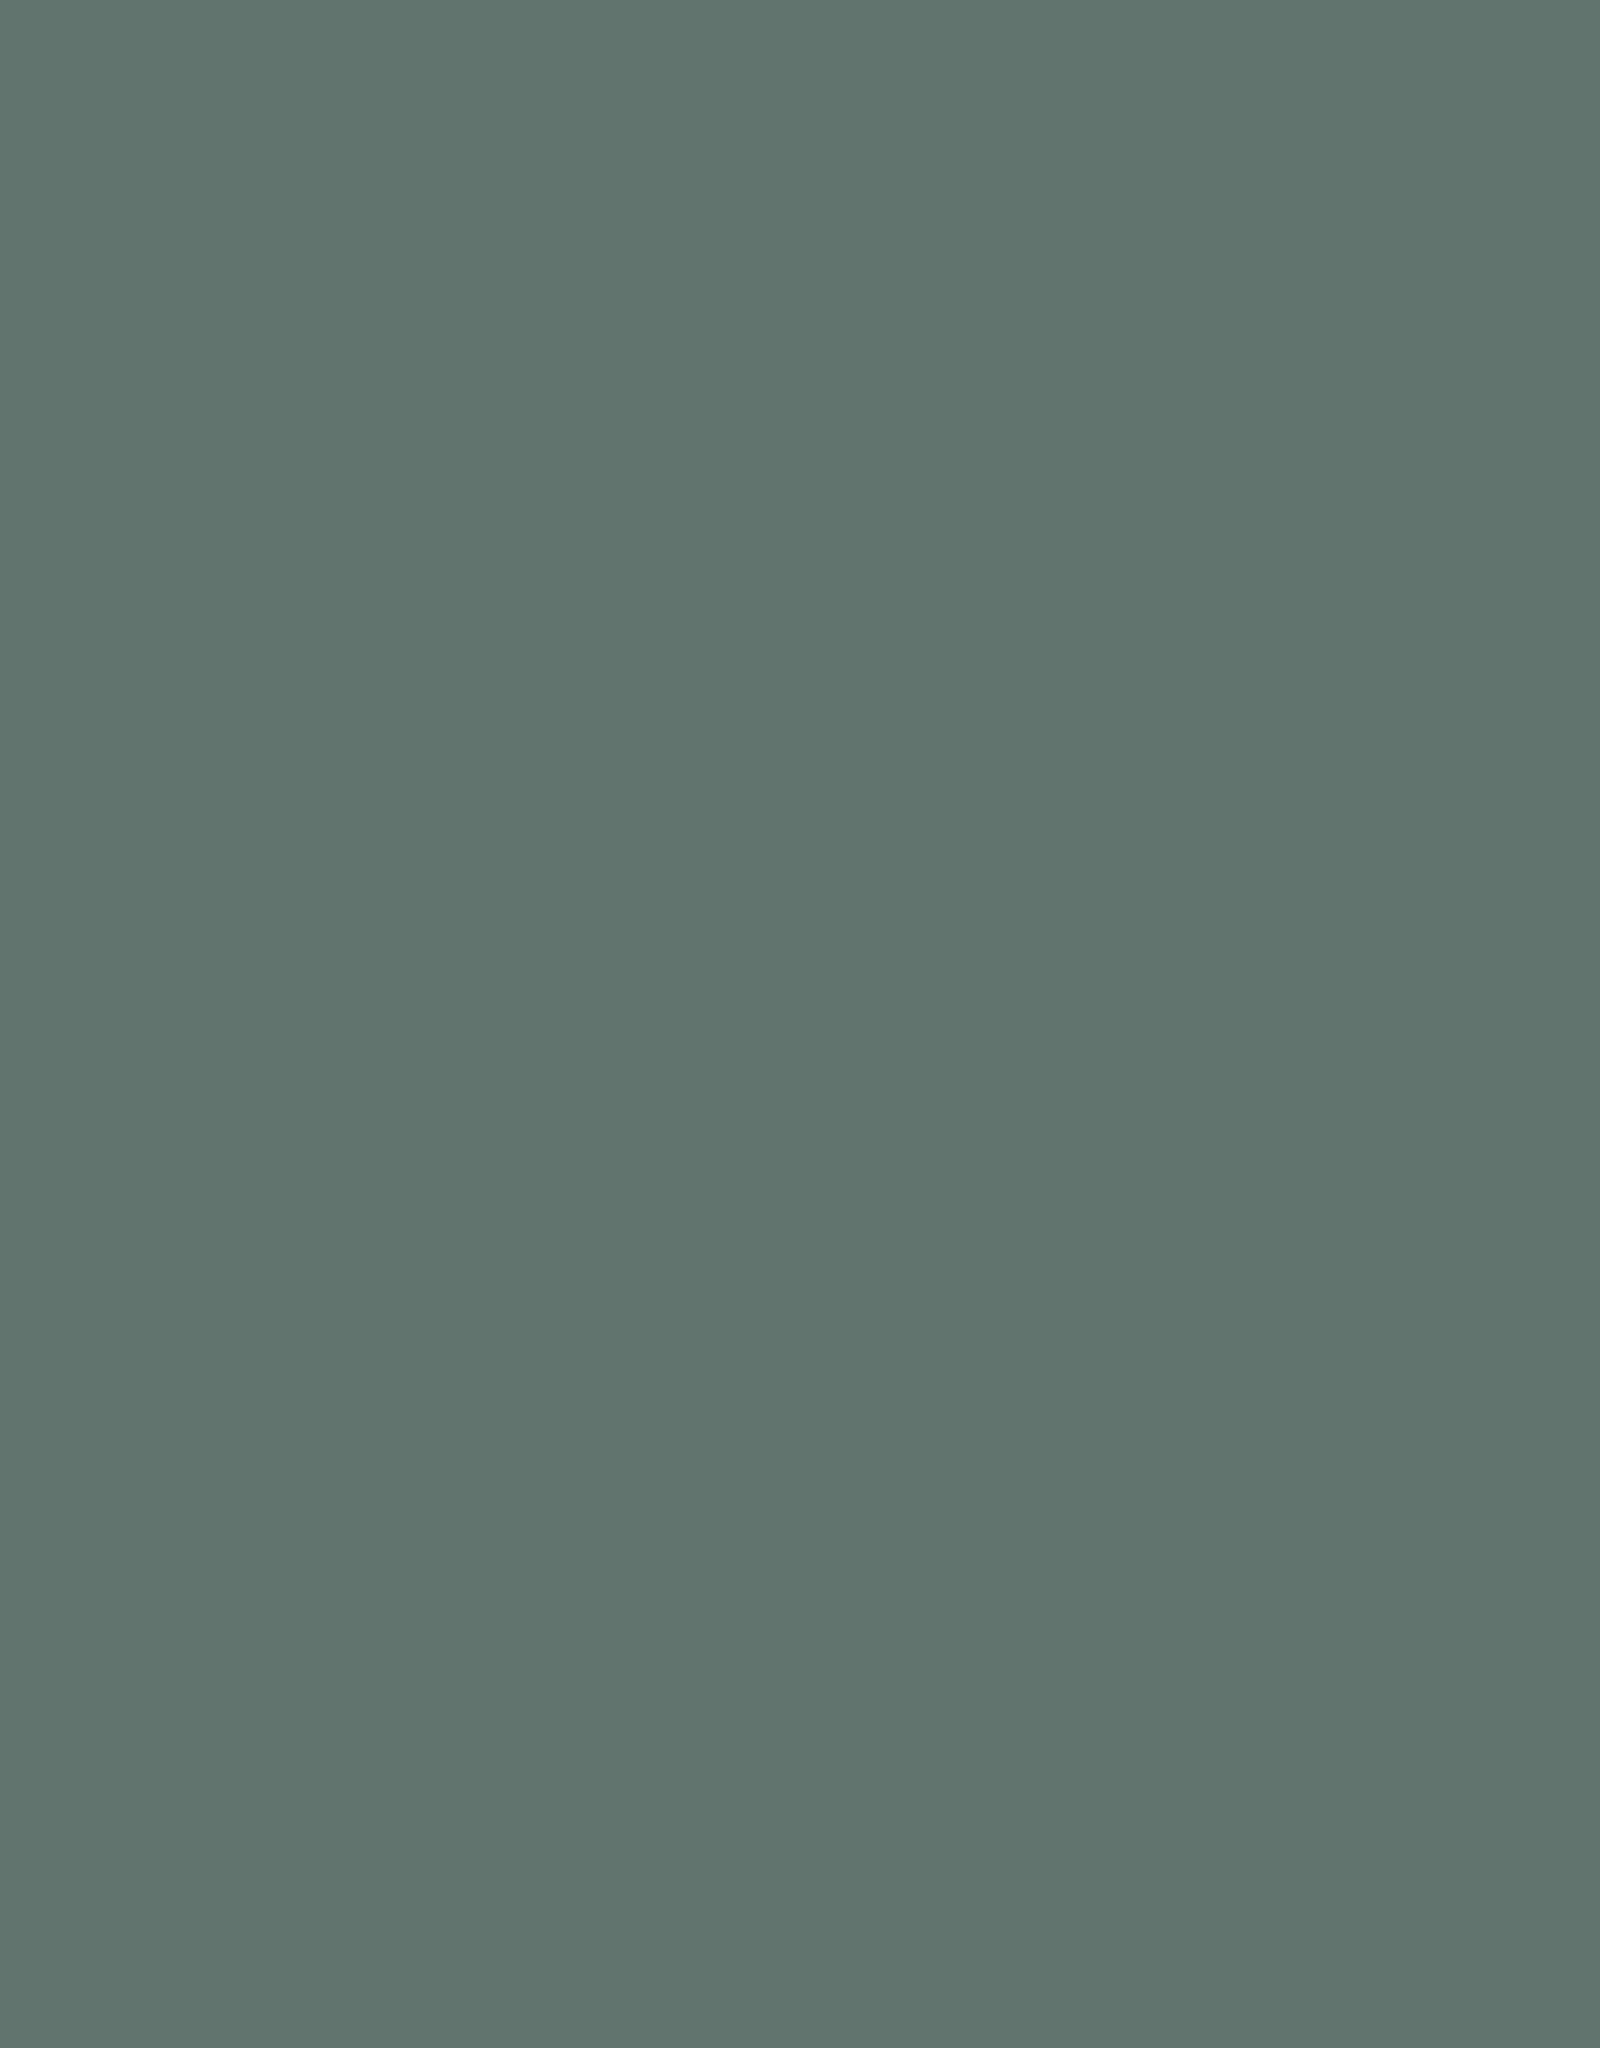 Sennelier, Extra Fine Soft Pastel, Shale Gray, N 951